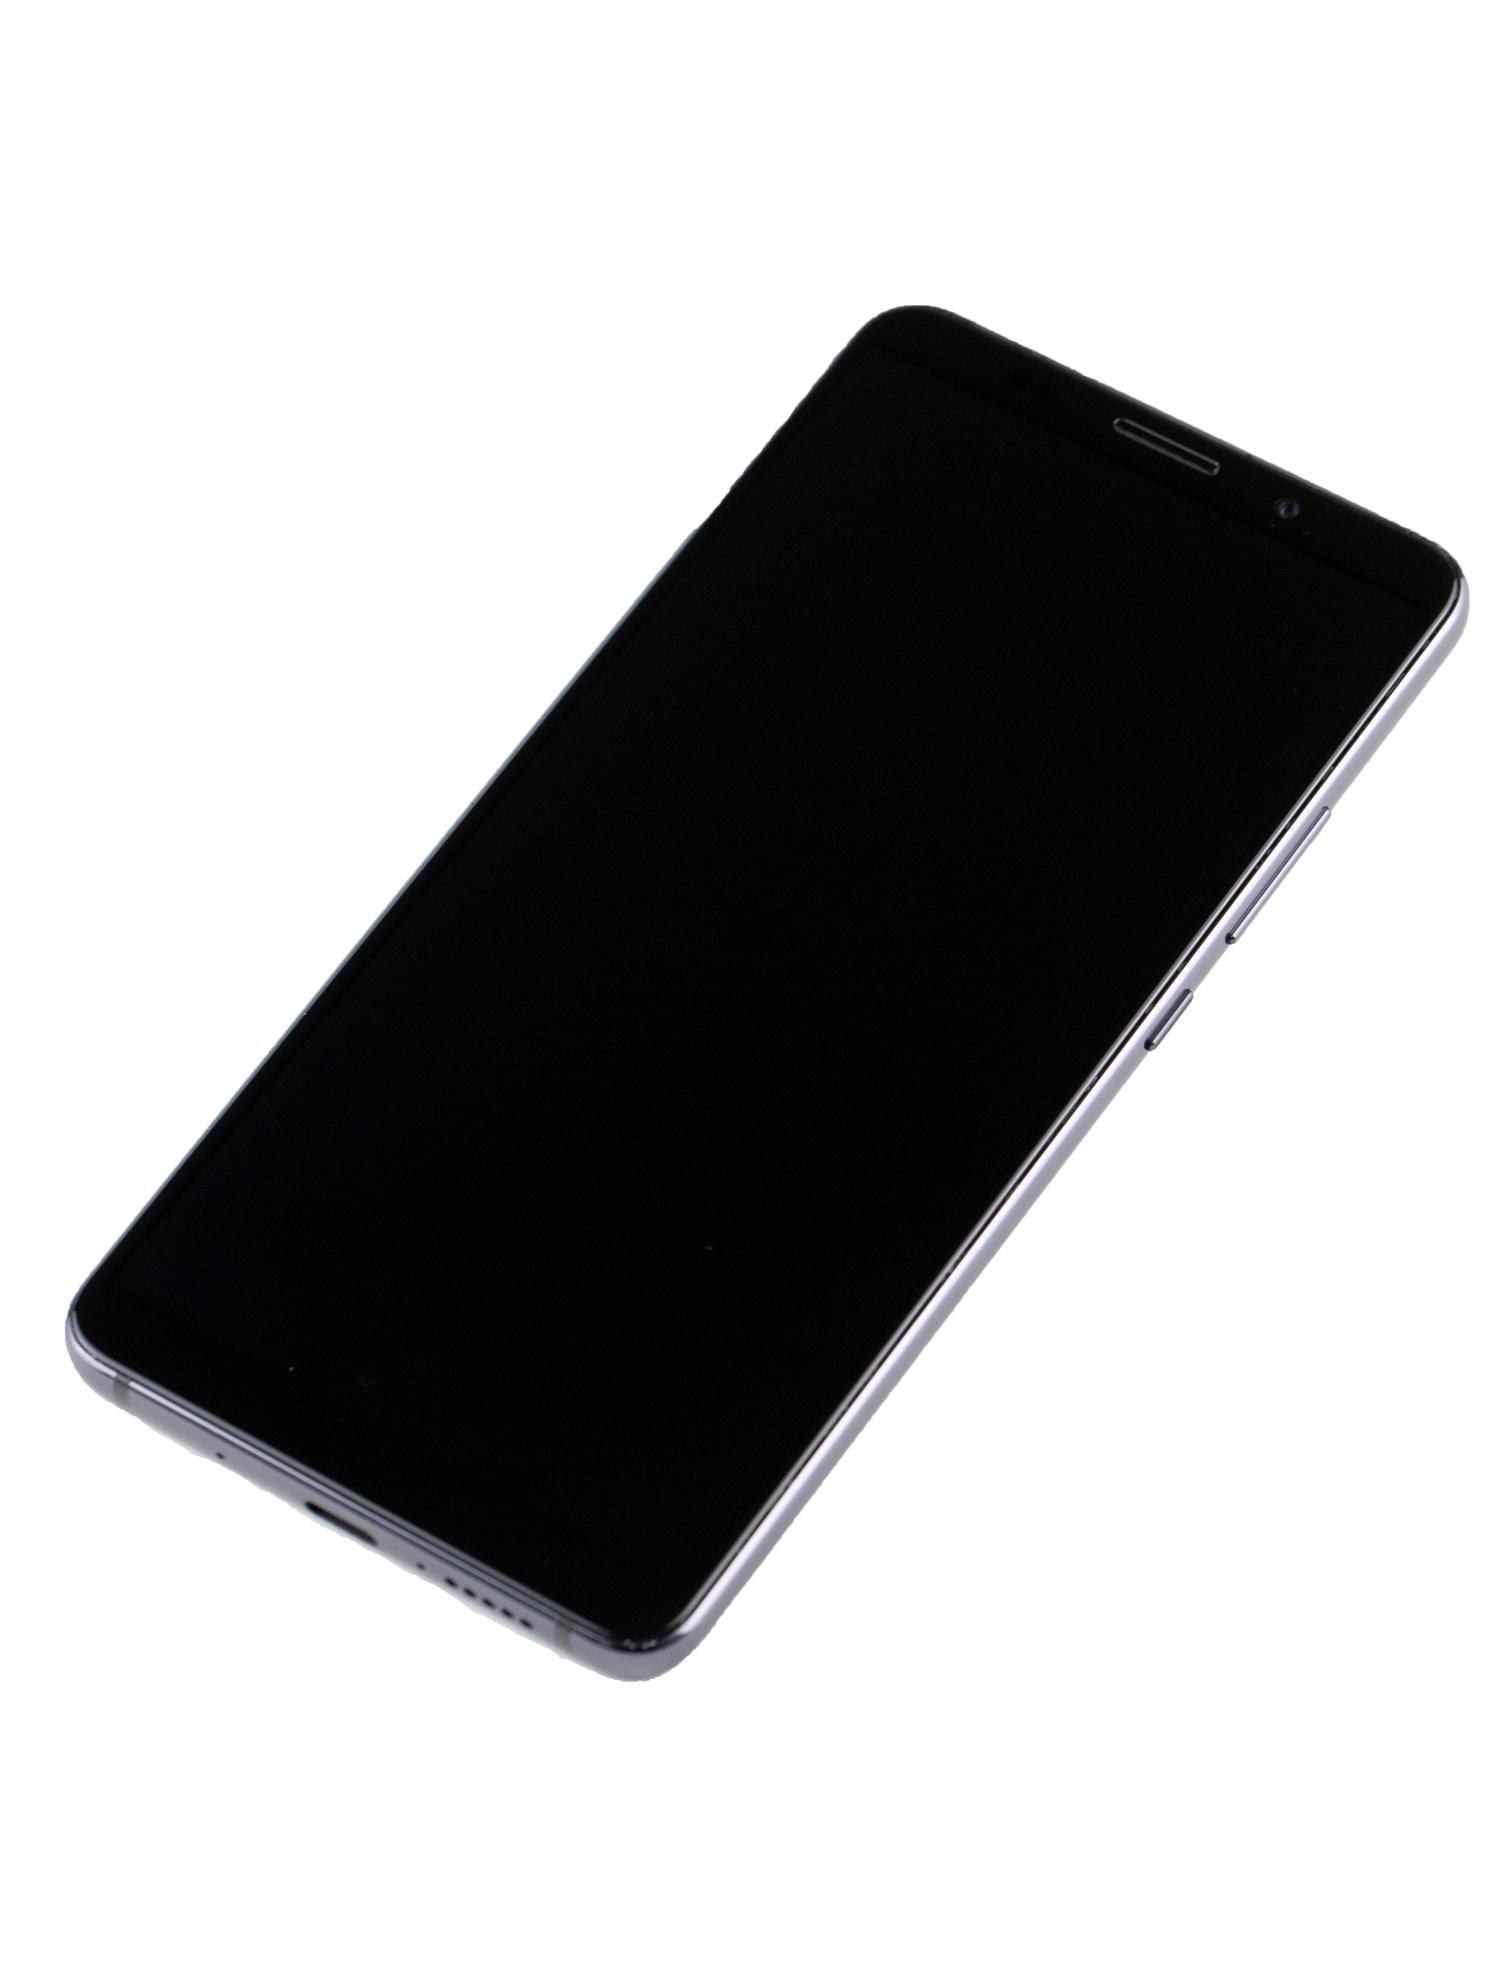 Huawei Mate 10 Pro BLA-L09 Display Module + Frame Gray